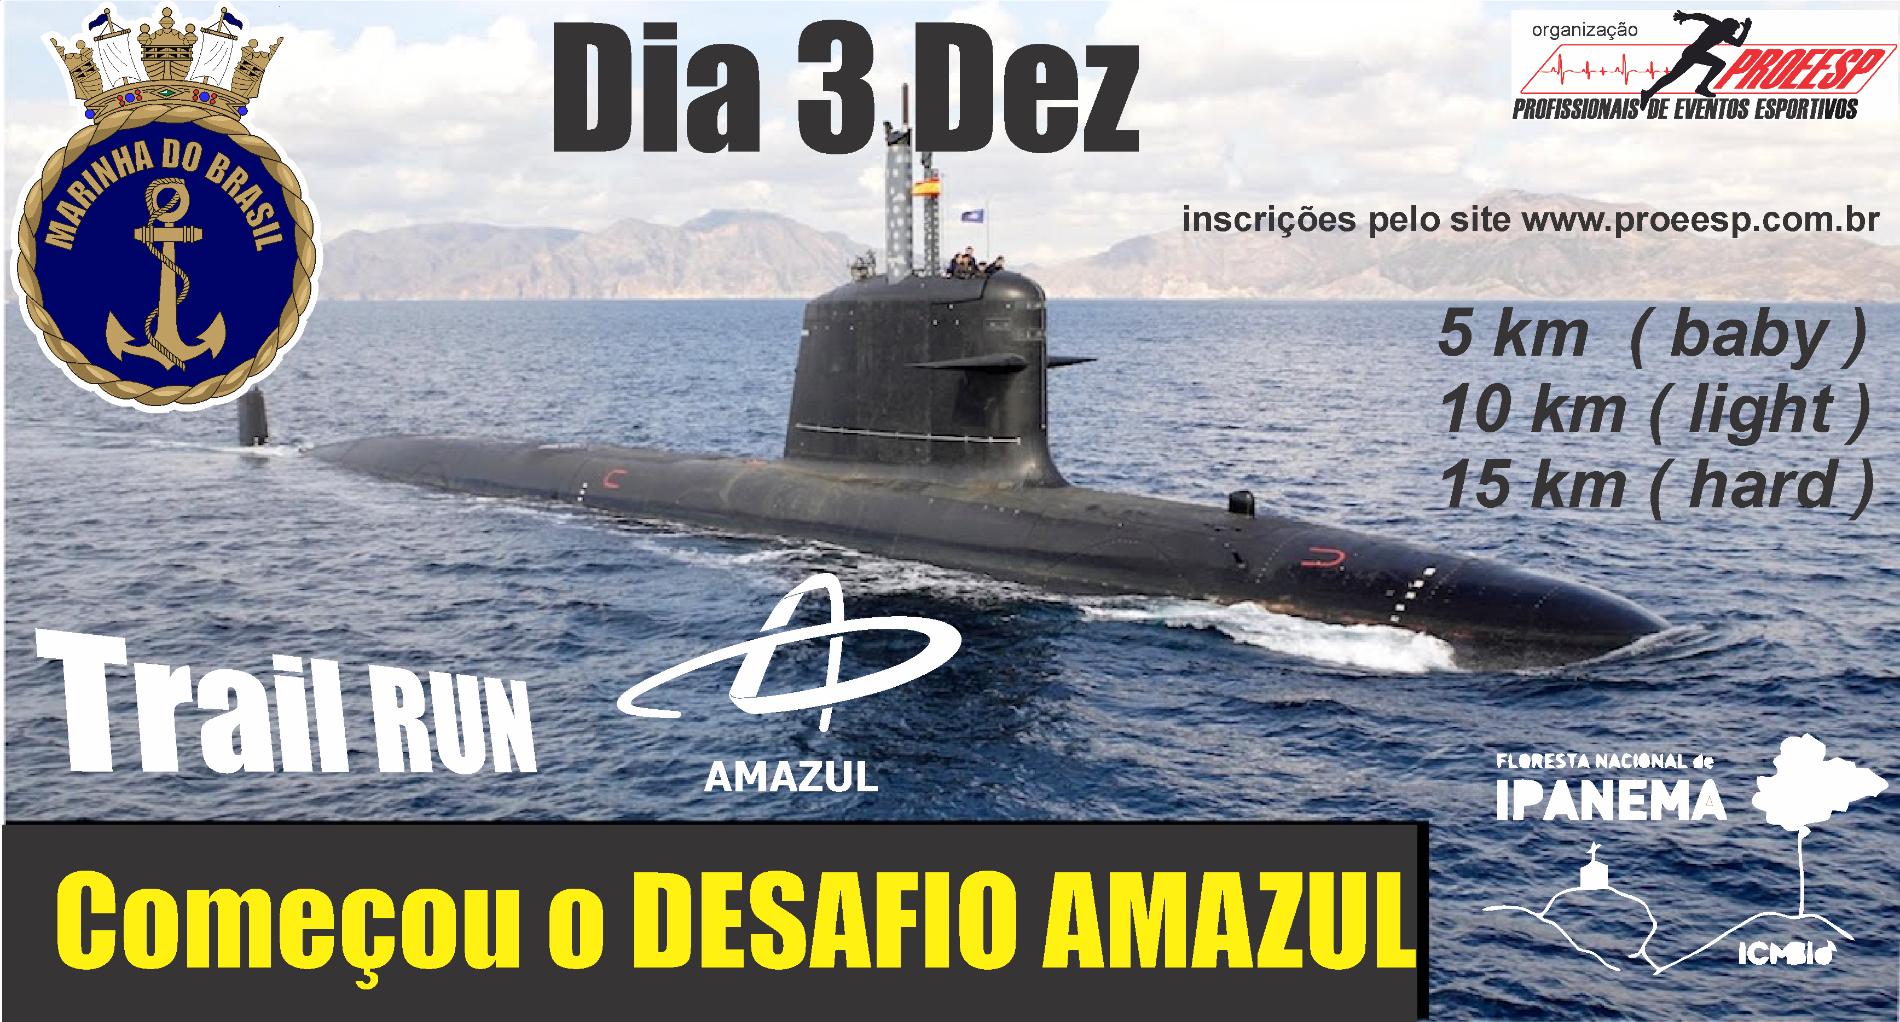 DESAFIO AMAZUL - Imagem de topo